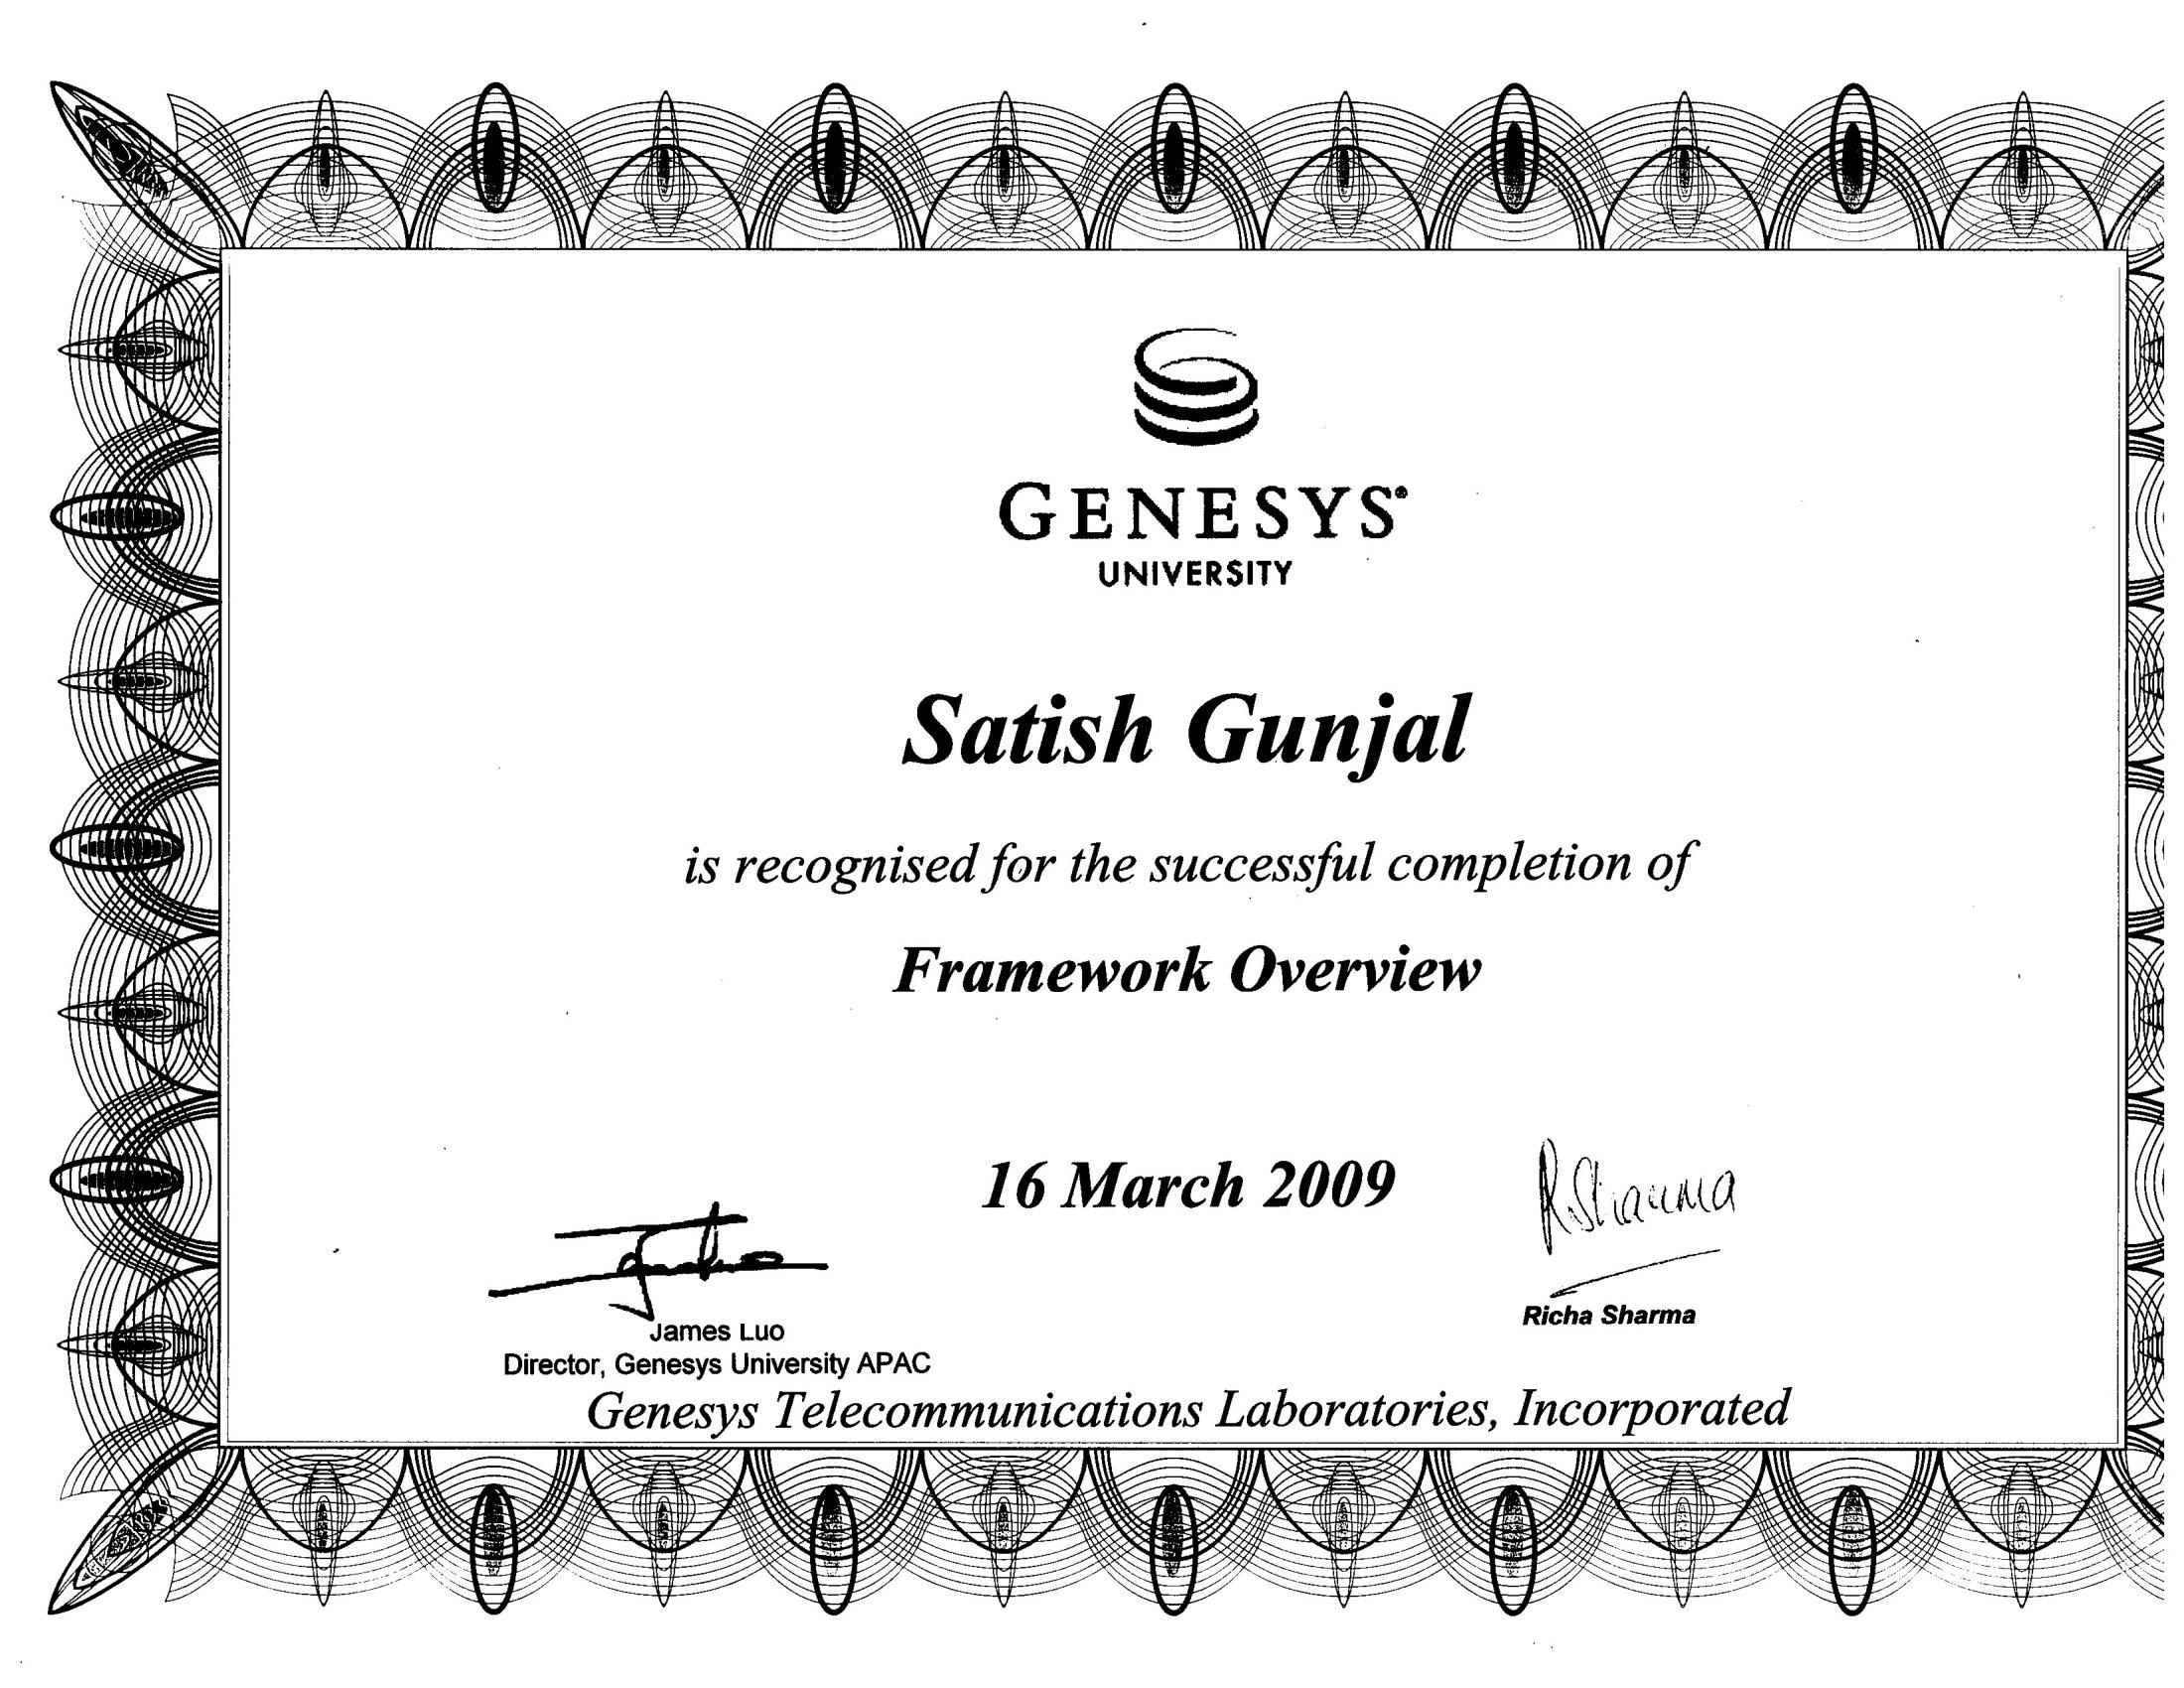 Genesys Framework Overview